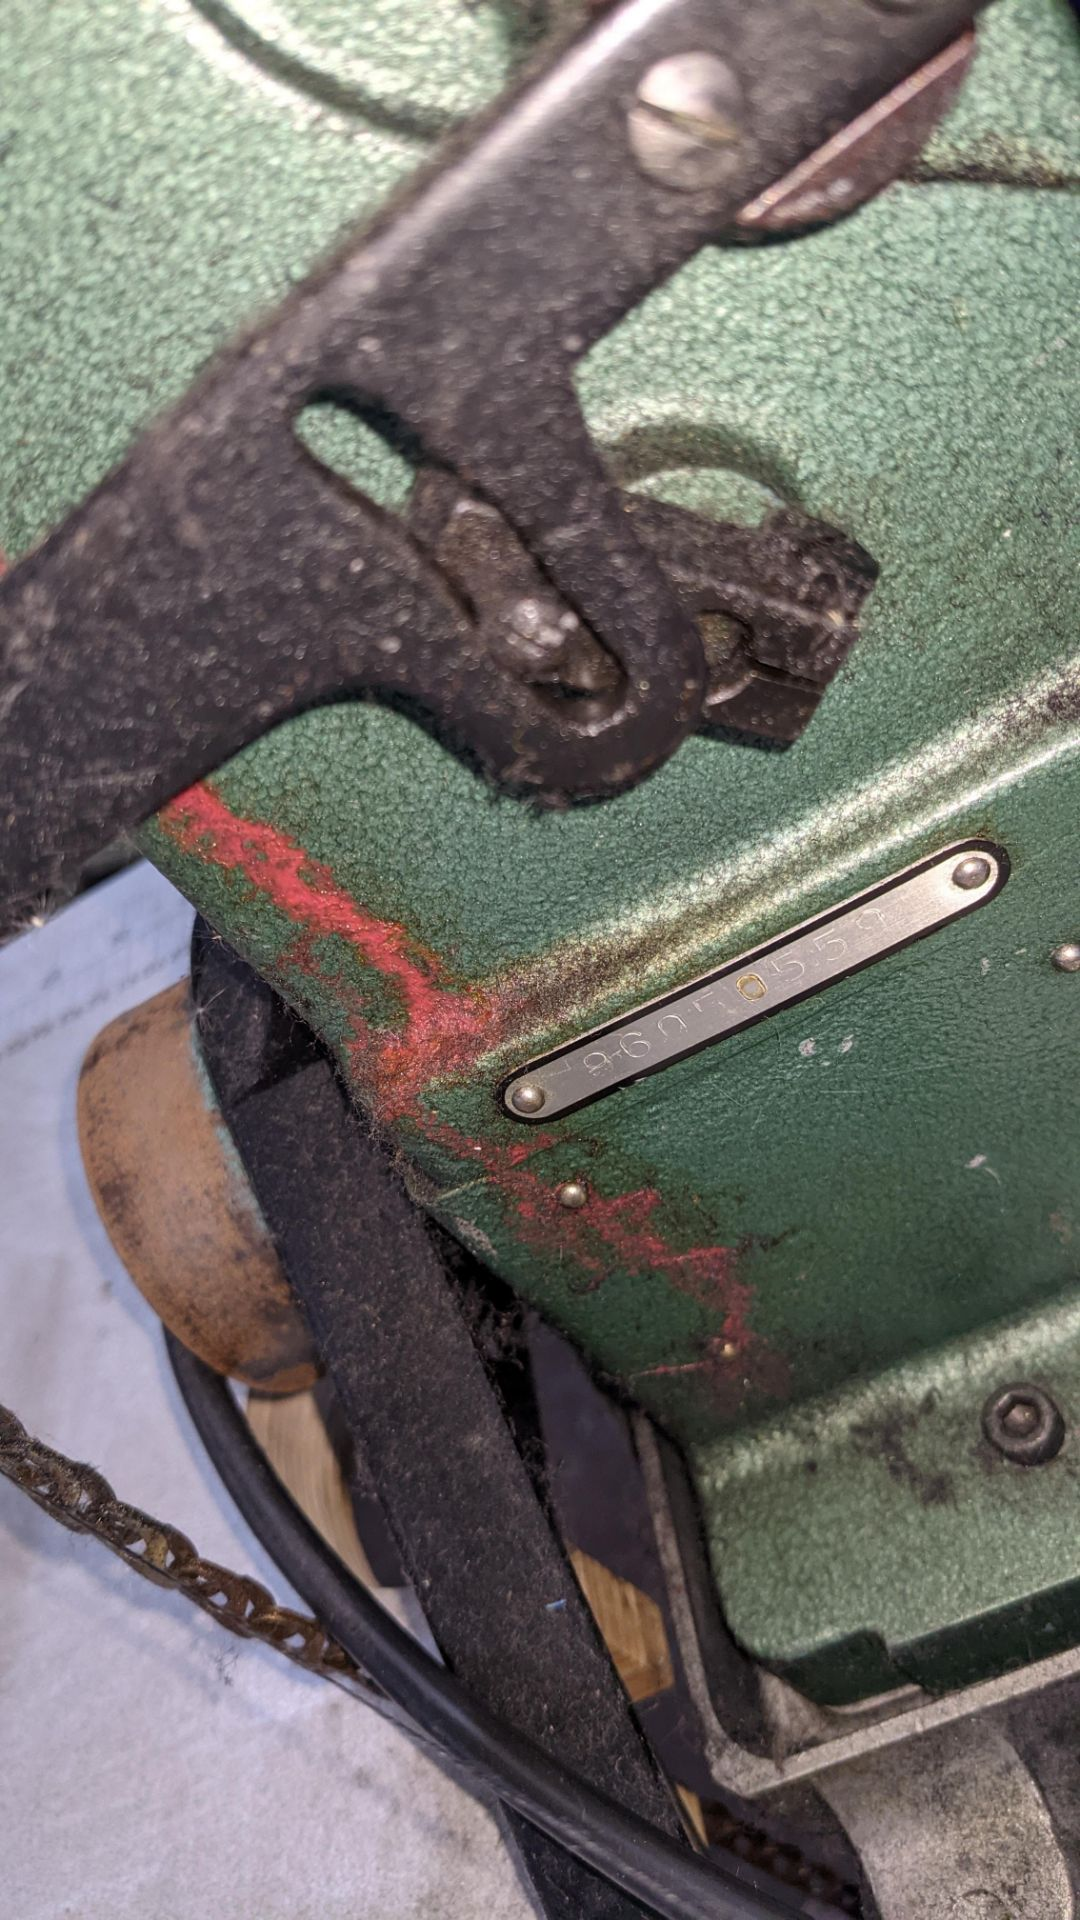 Sewing machine - Image 10 of 16